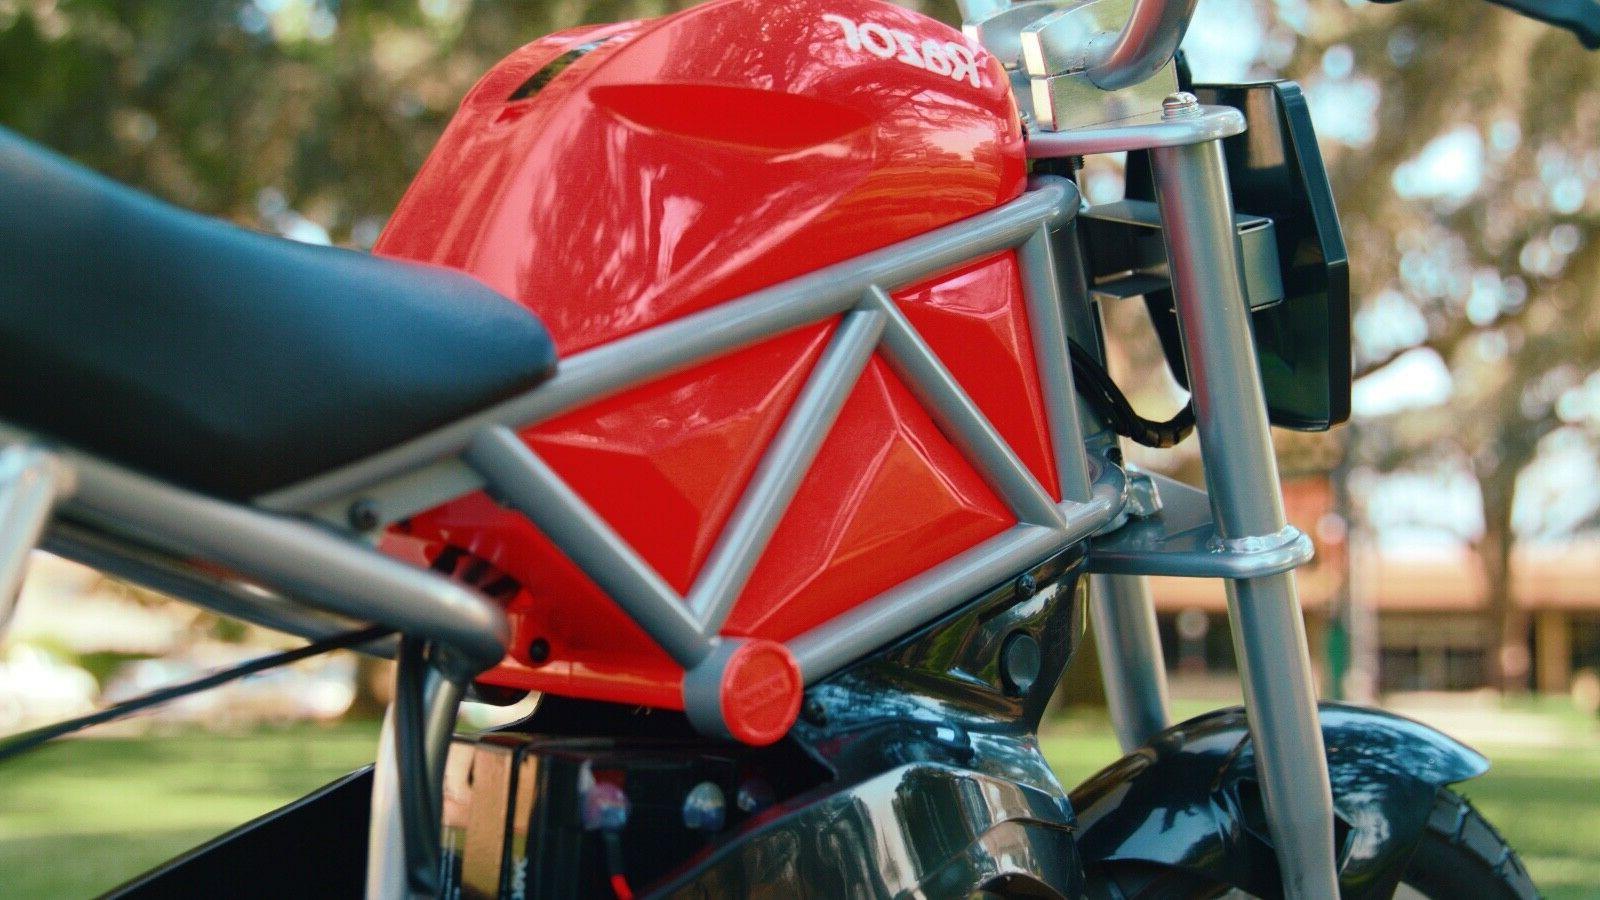 Razor 24 V Battery Motor Bike Free